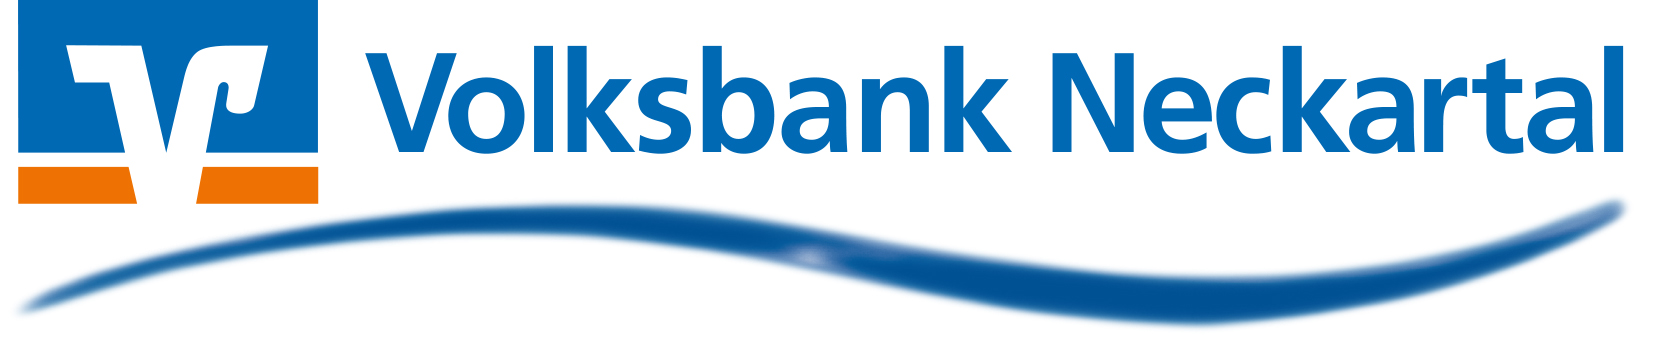 Volksbank Neckartal eG Geschäftsstelle Gauangelloch Logo